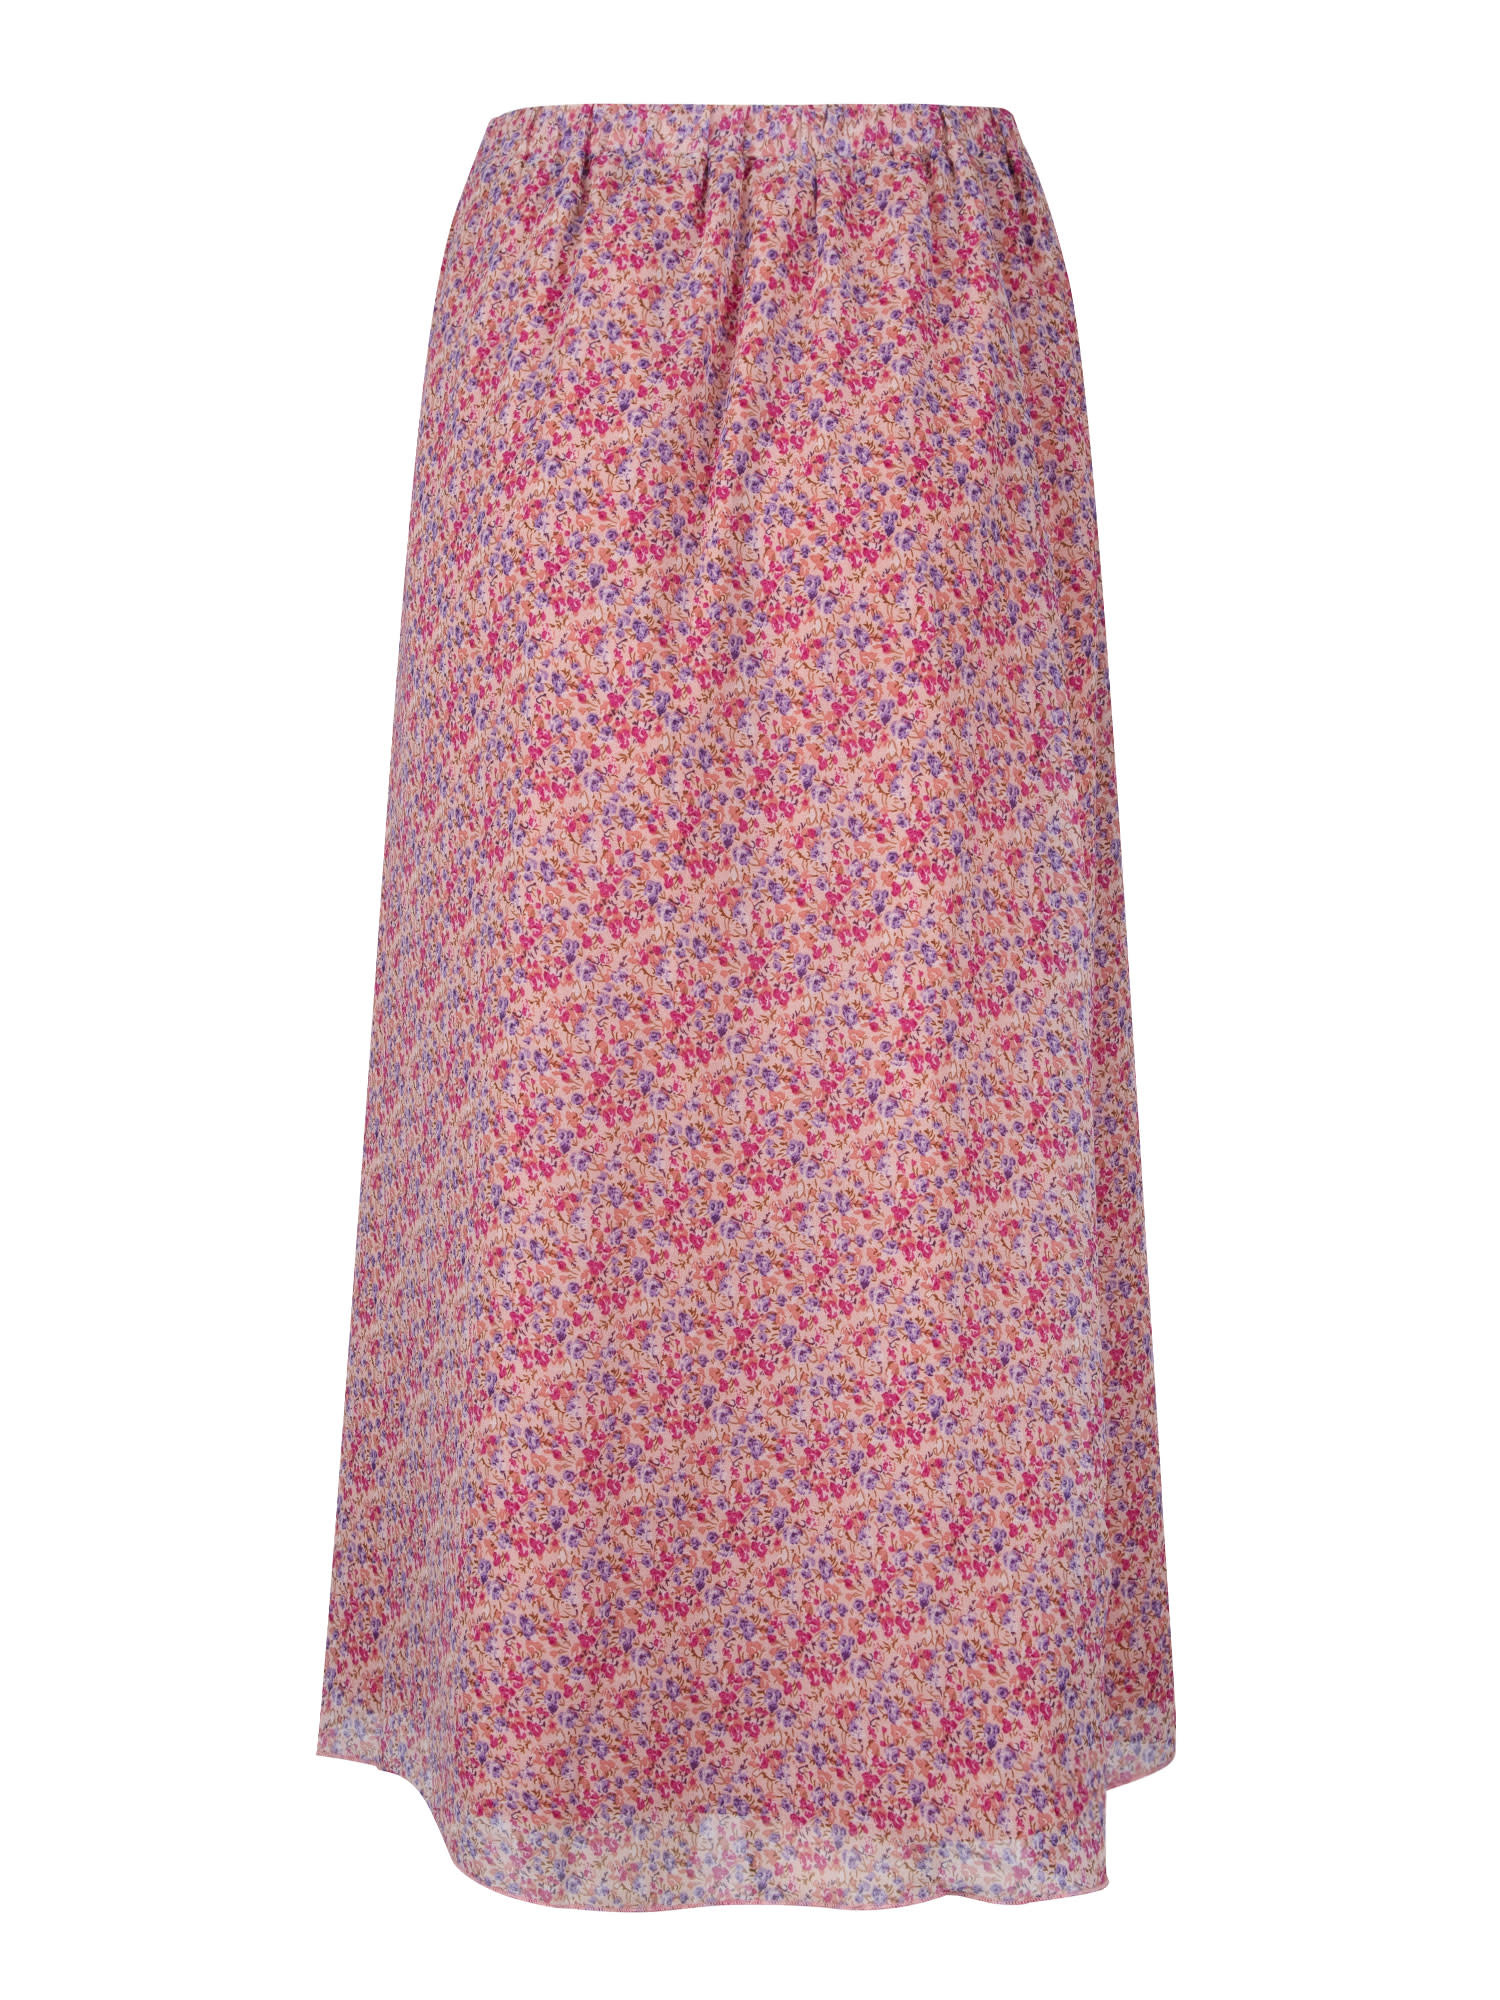 YDENCE YDENCE - Rok heather lila bloemenprint